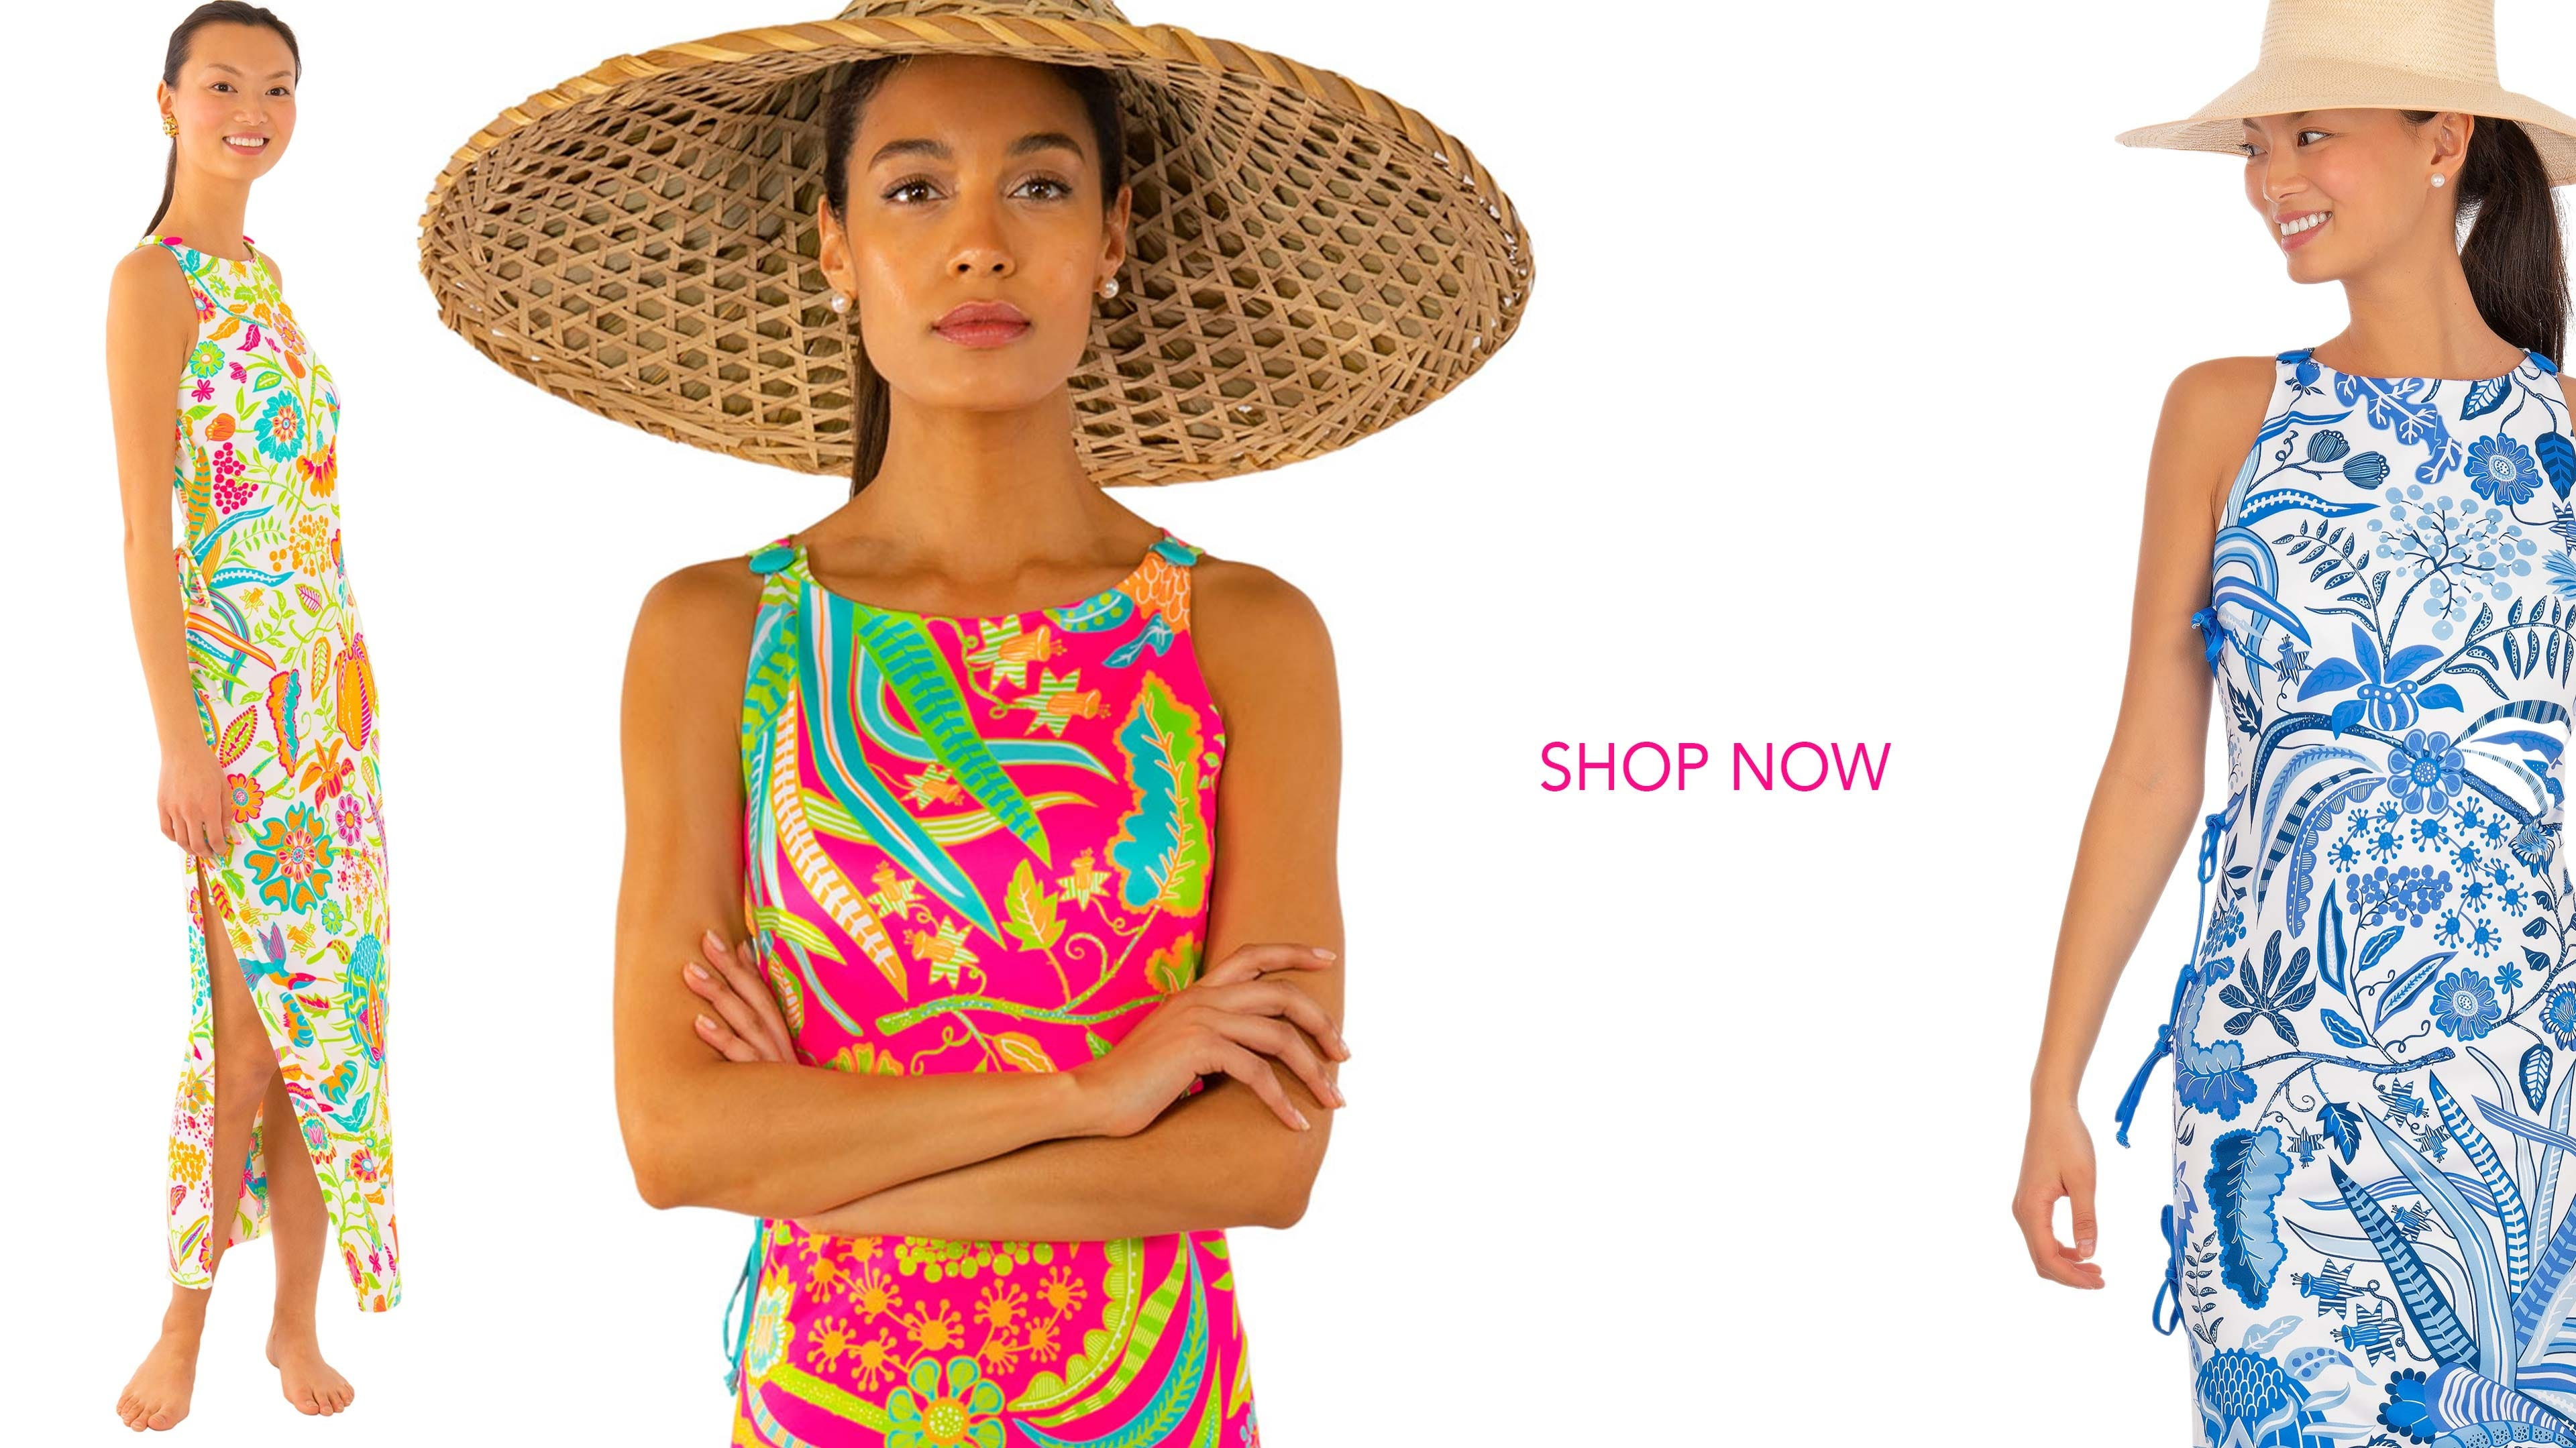 3cbb711b80e Tunics - Dresses - Beachwear - Resort Wear - Gretchen Scott Designs - Happy  Clothes